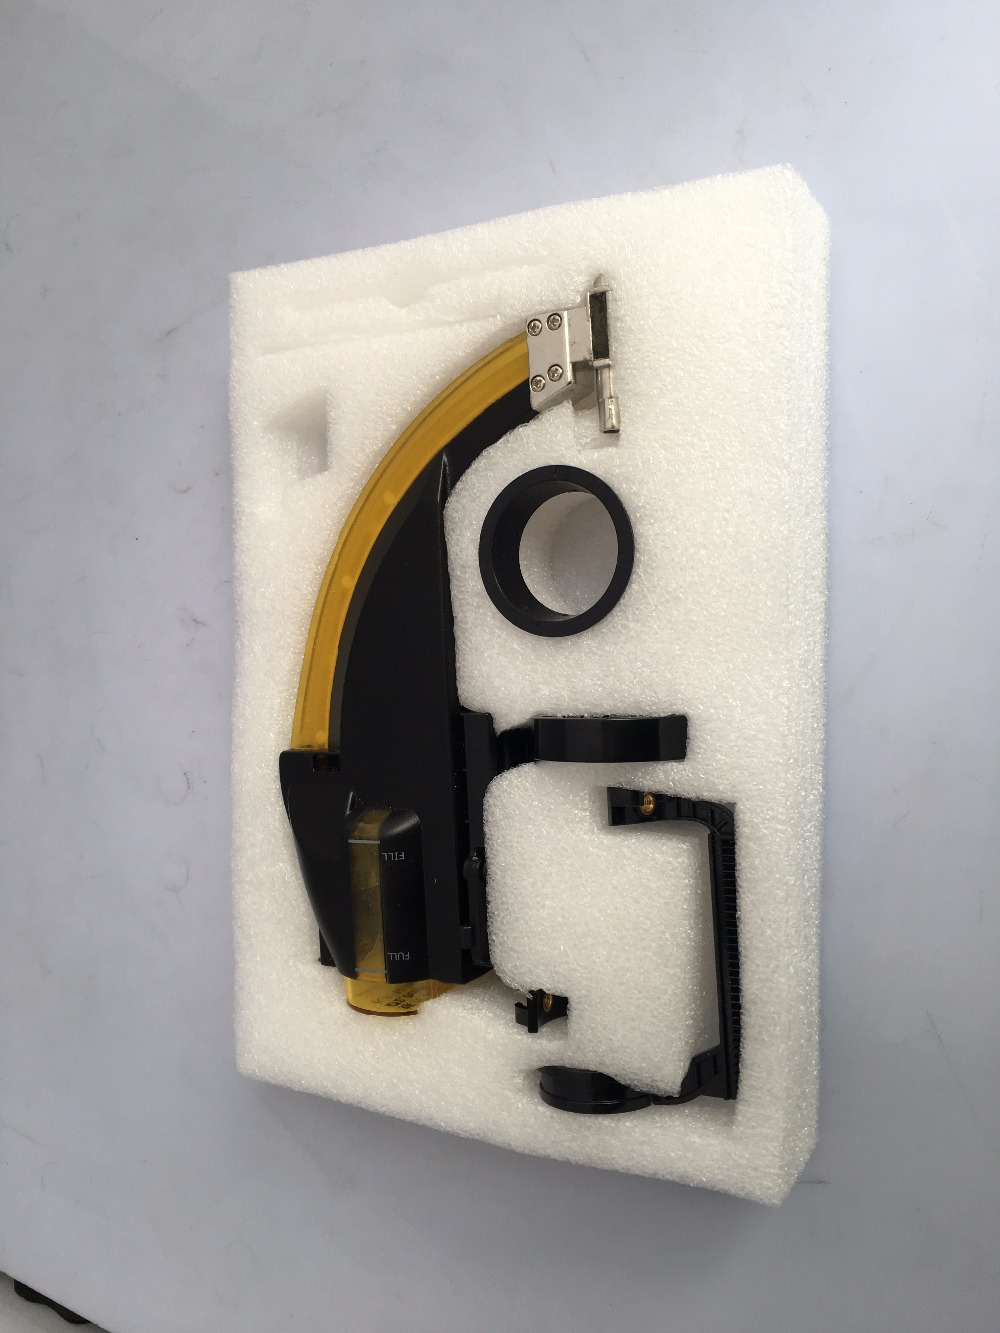 The new automatic screw conveyors, automatic screw arrangement handheld device 2.0#,2.3# lyn stone the arrangement